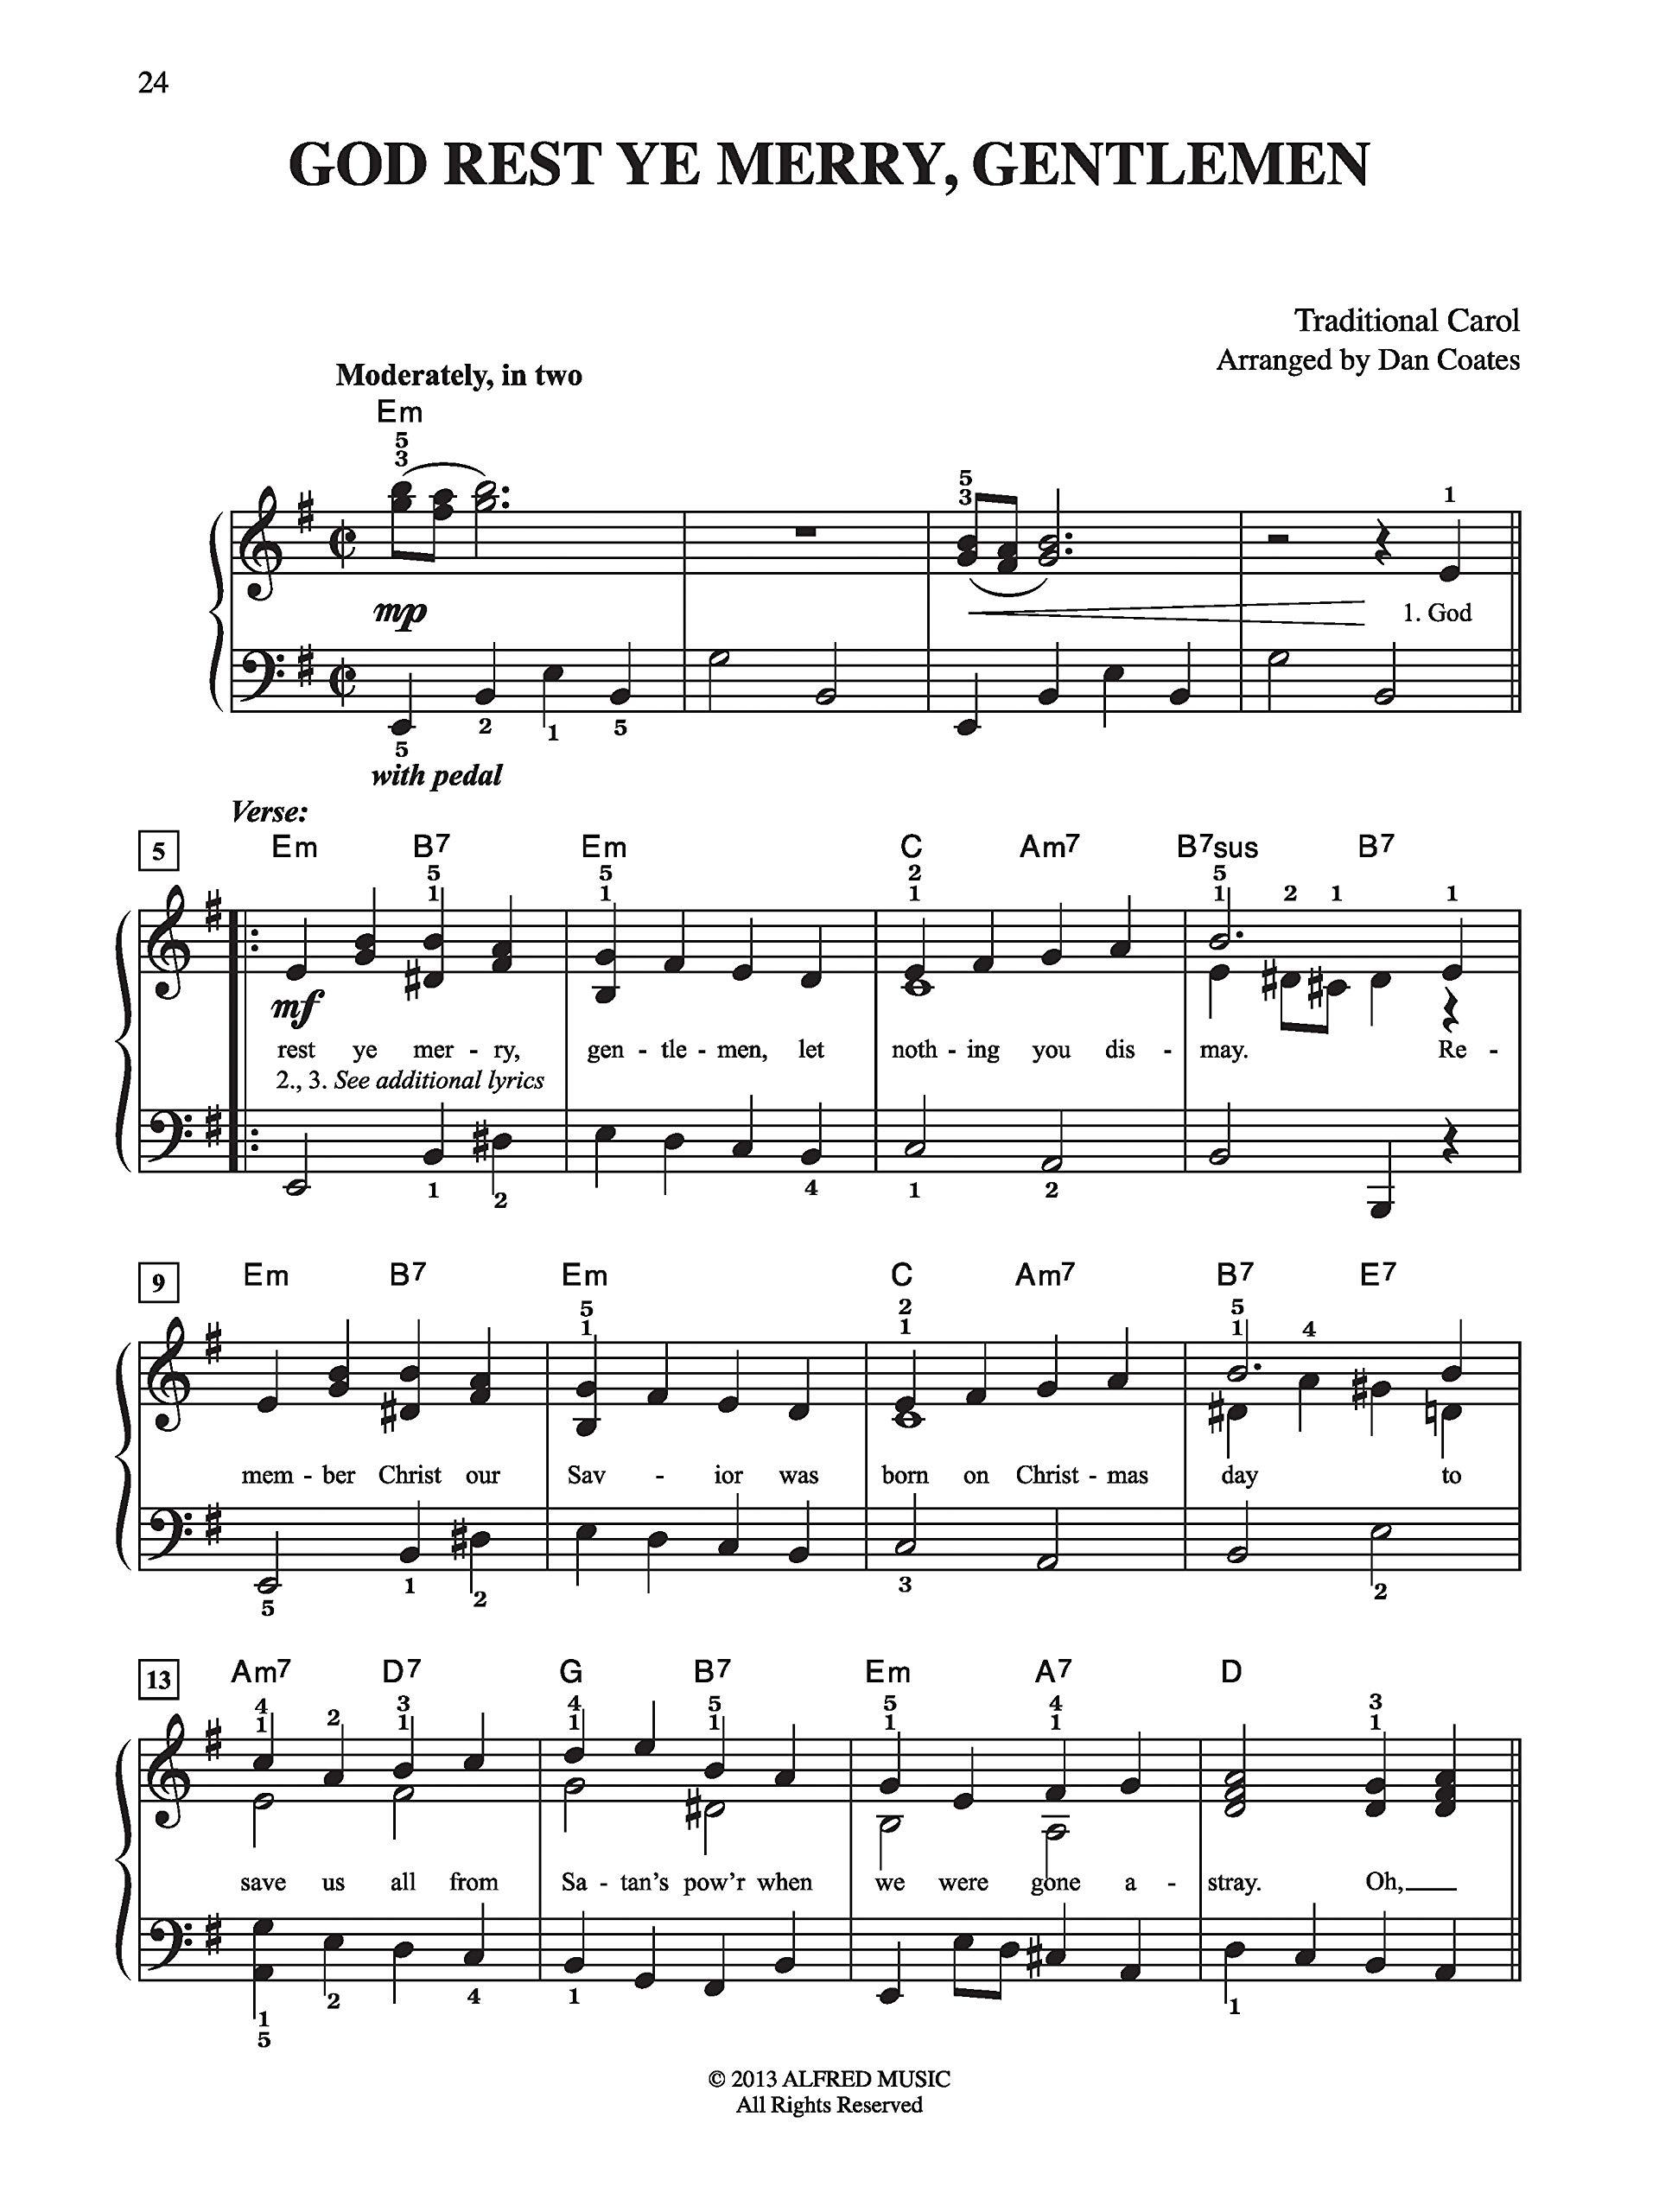 Rockin Around The Christmas Tree Piano Sheet Music.Top Requested Christmas Sheet Music Easy Piano Top